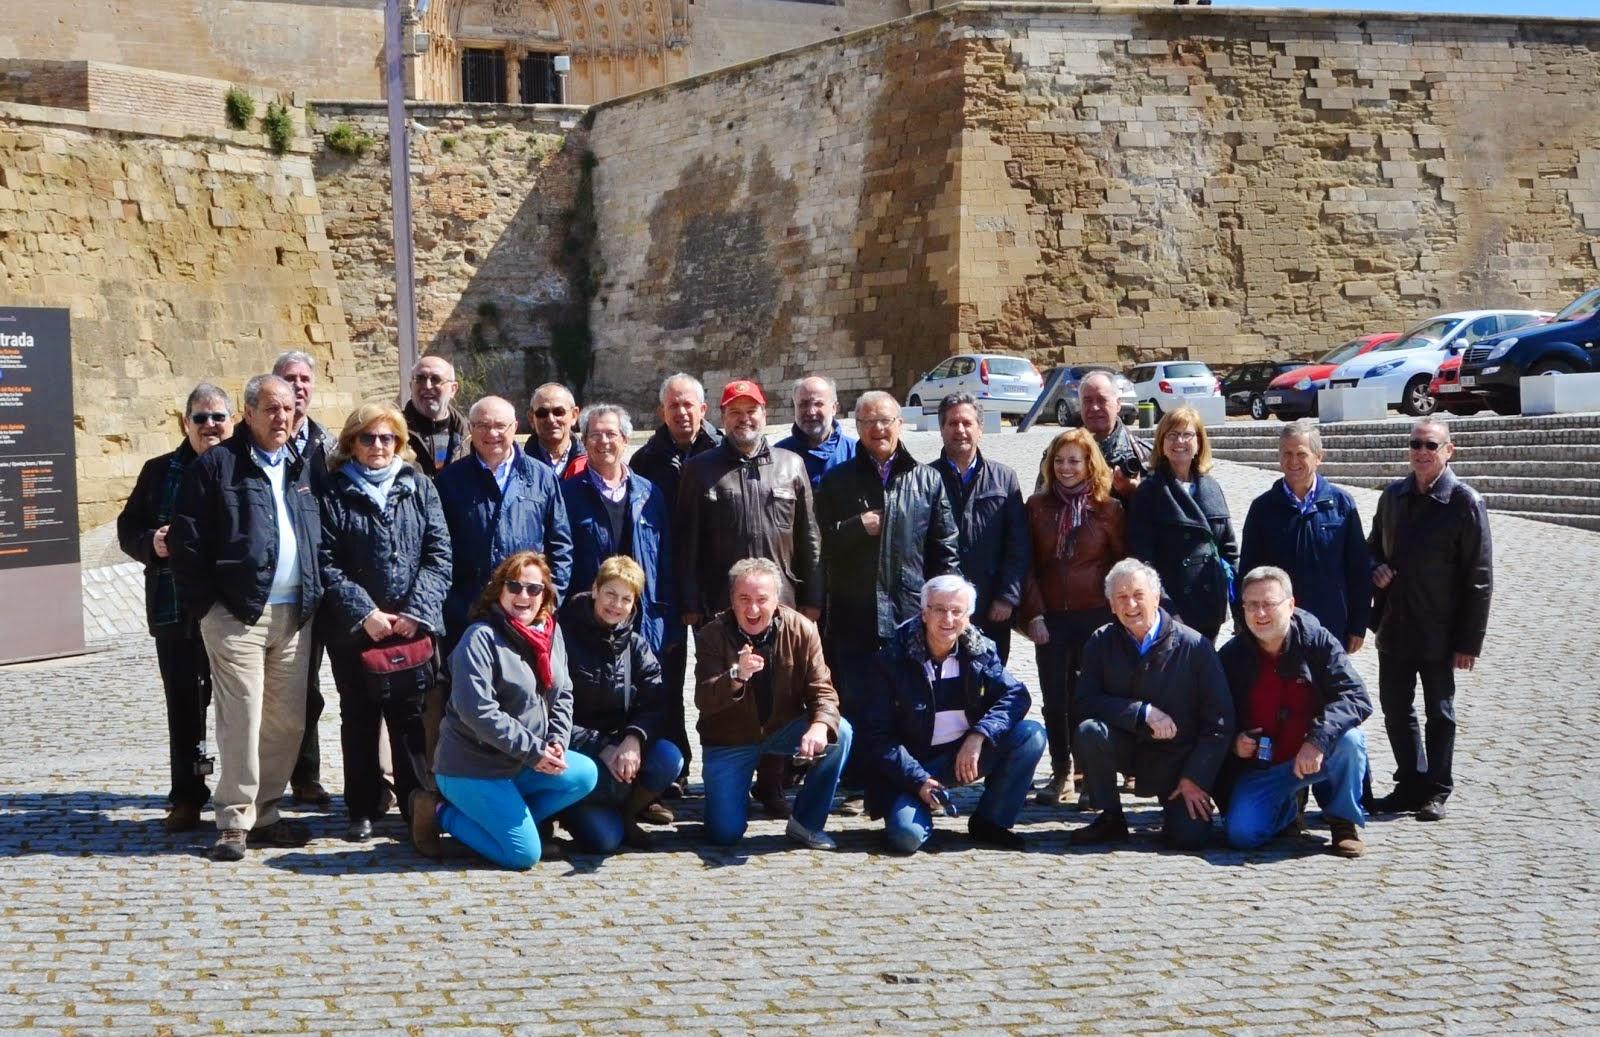 27-3-14 Lleida, Anglesola, Cervera